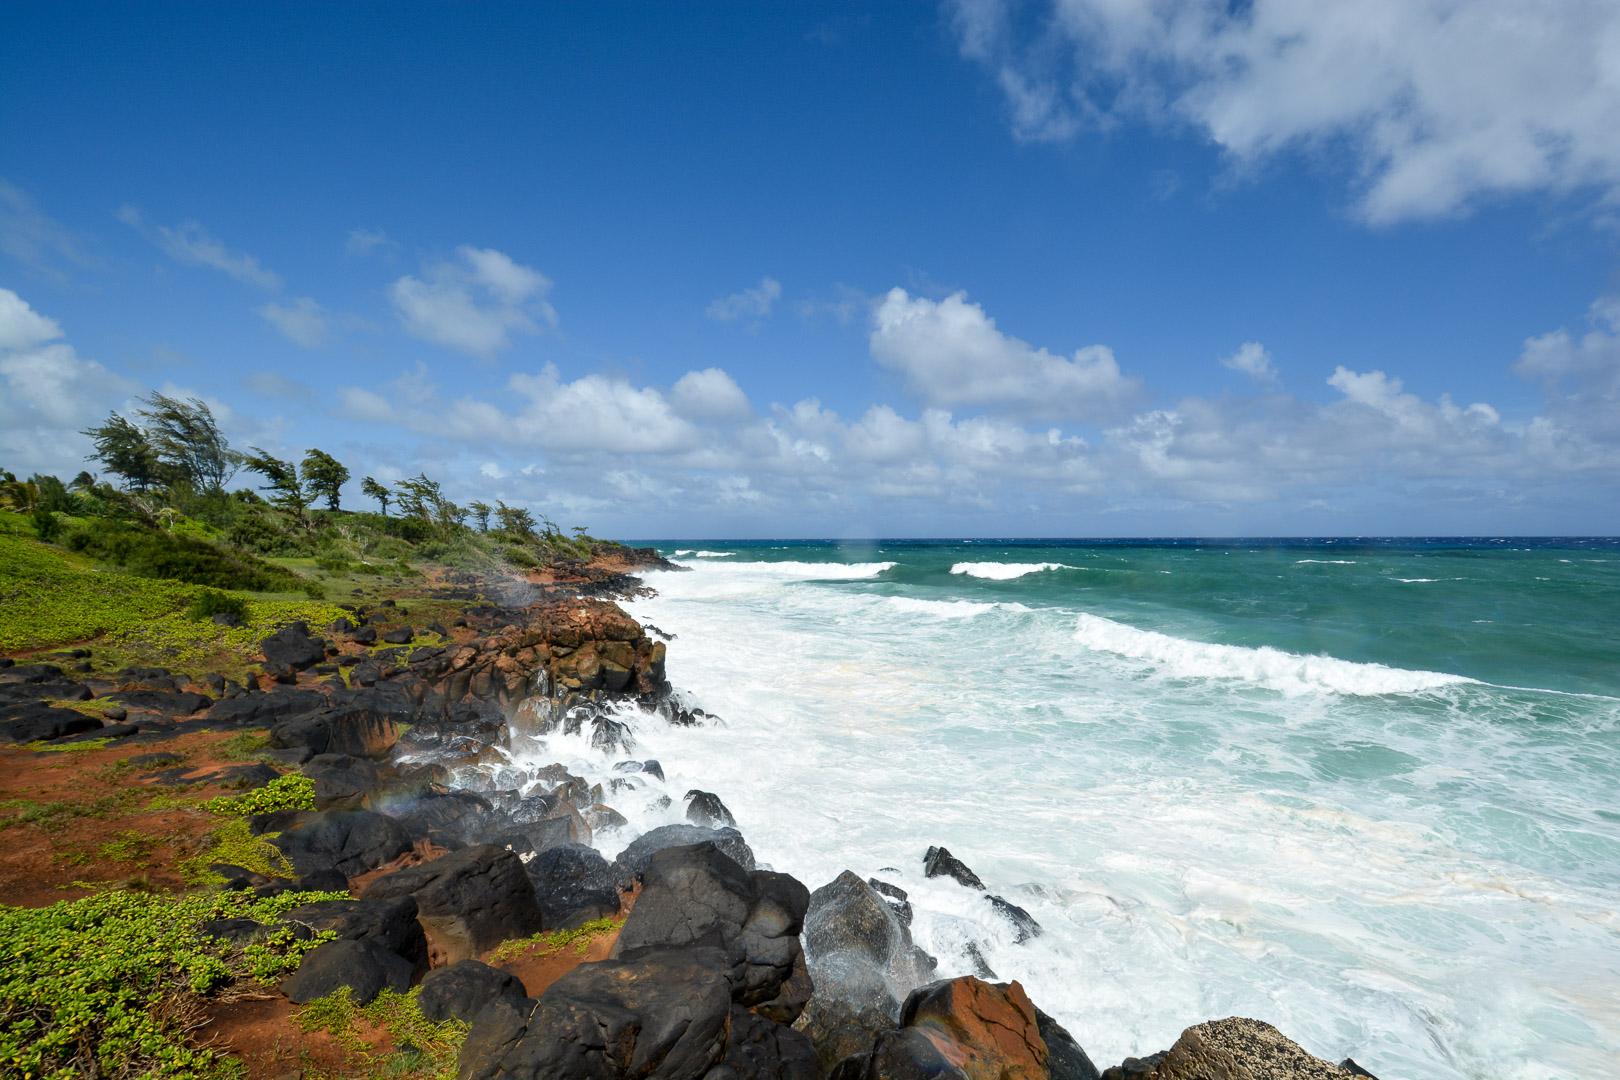 Along the Coconut Coast